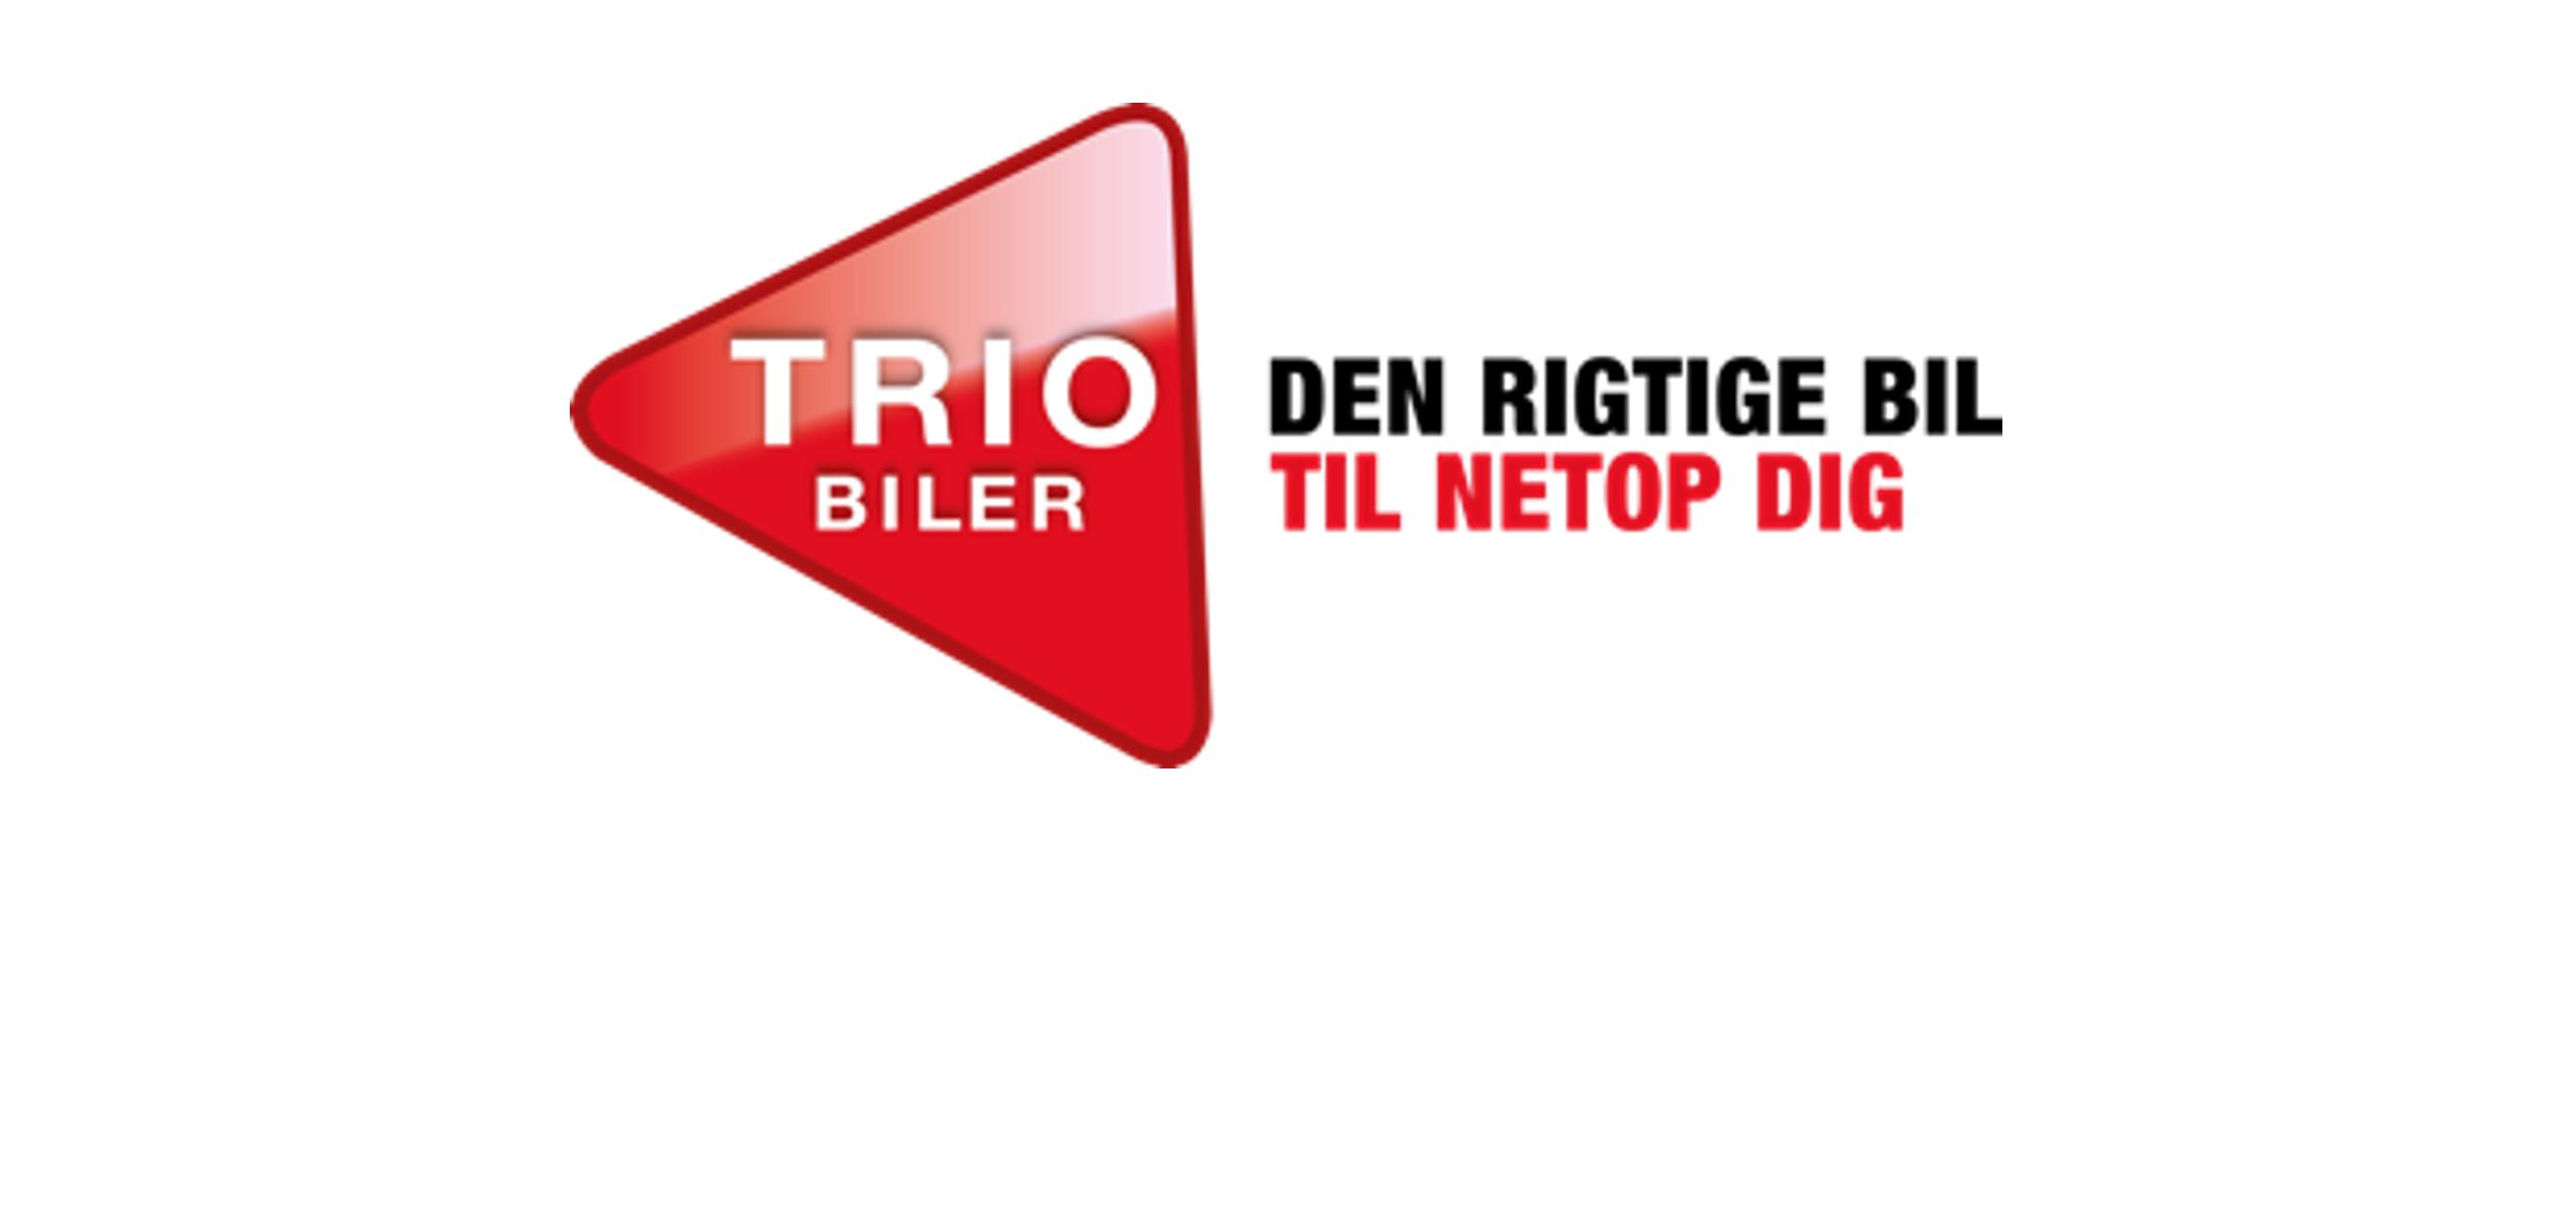 Trio Biler app